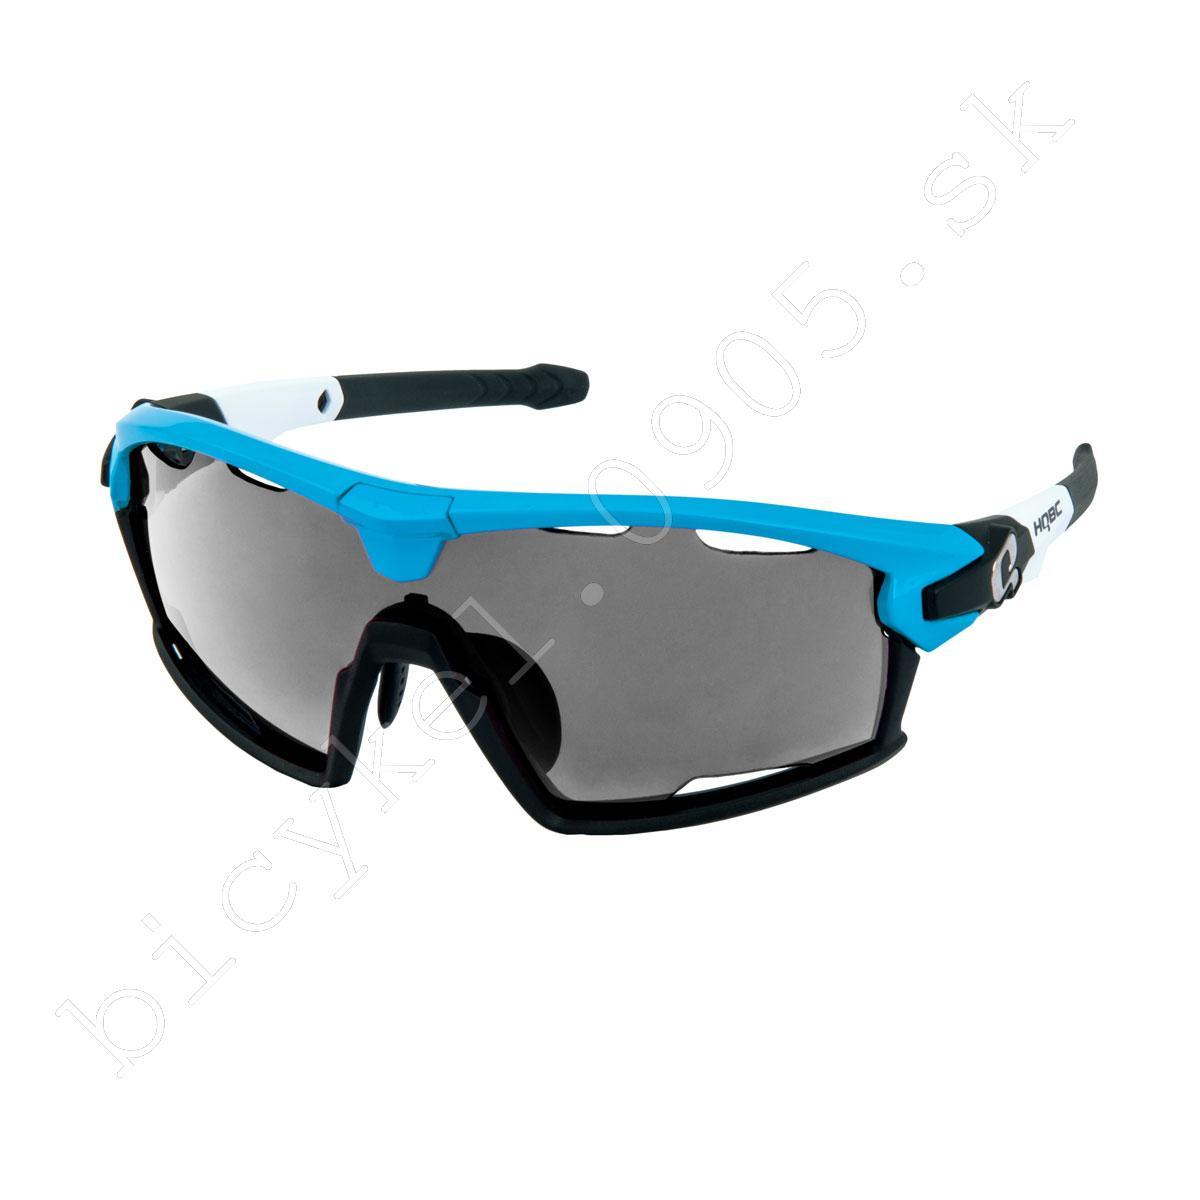 Okuliare QERT PLUS FF modré 3v1 + sklo+rámik 9568c575c0a